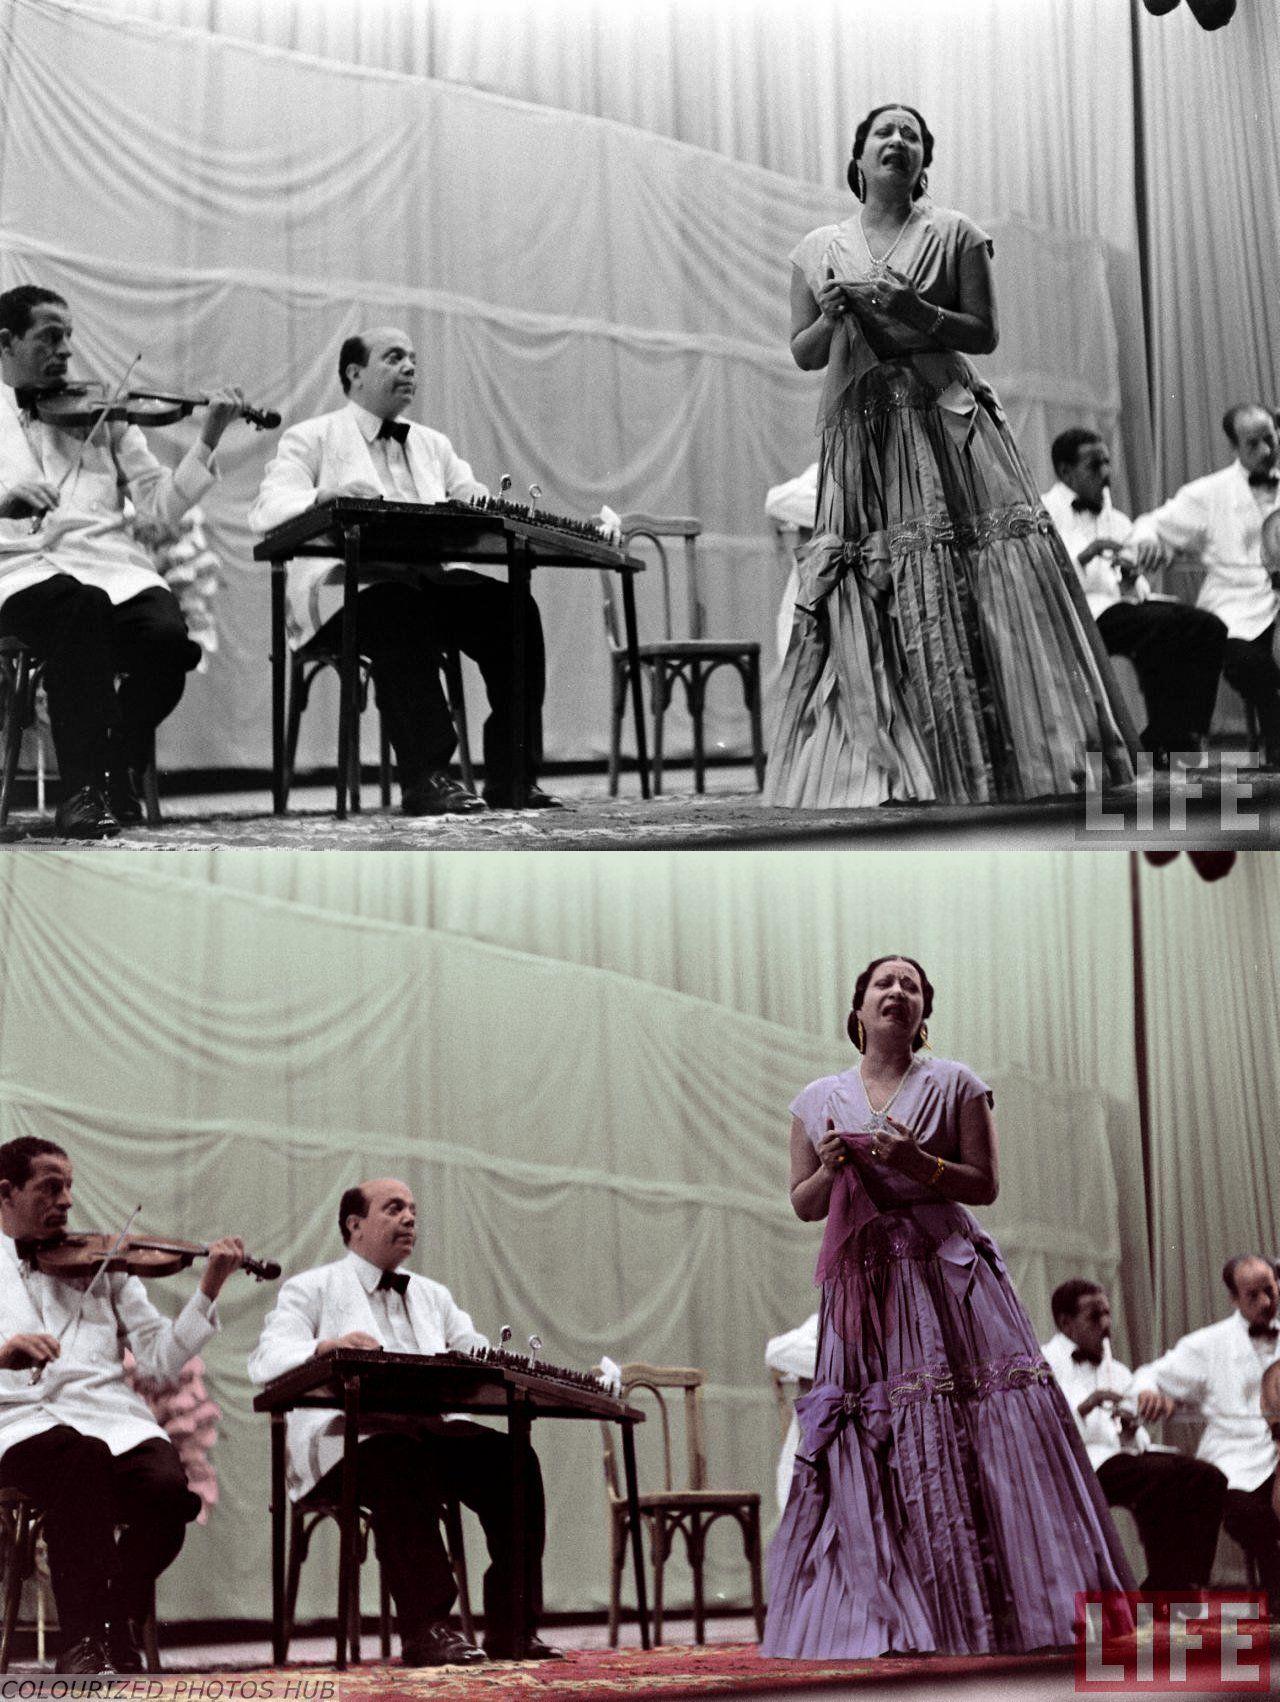 #ColorizedPhoto #Singer Fatimah Ibrahim As Sayyid Al Biltaji (Um Kulthum) Circa 1940s Egyptian singer and songwriter